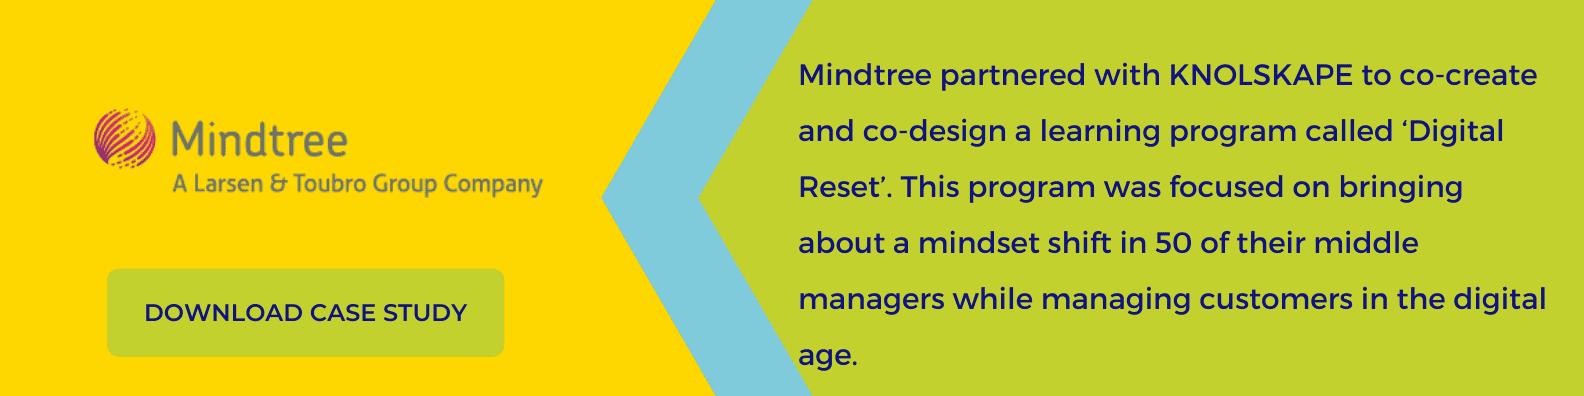 digital reset at mindtree